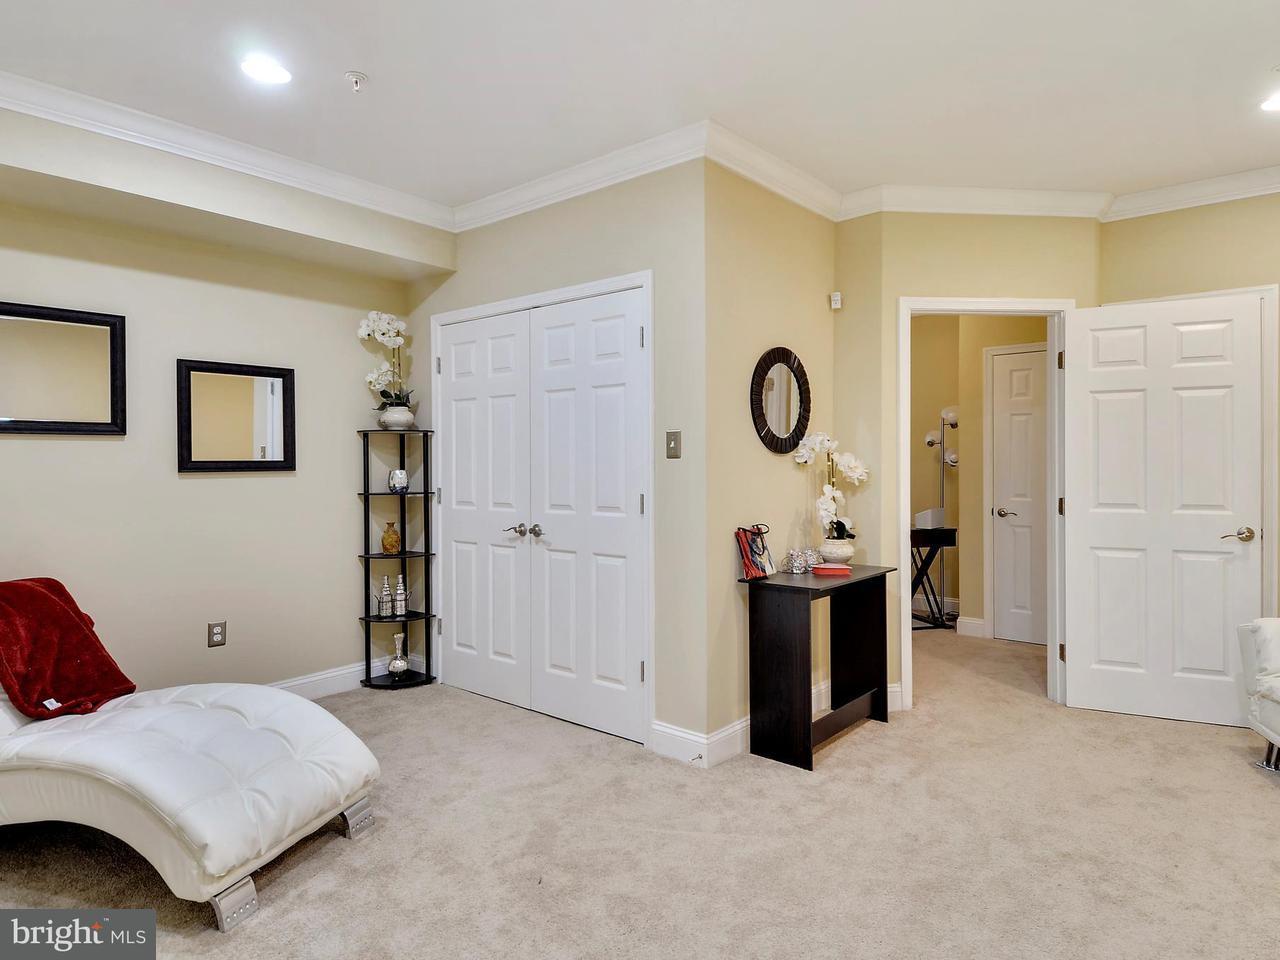 Additional photo for property listing at 5209 D ST SE 5209 D ST SE 华盛顿市, 哥伦比亚特区 20019 美国